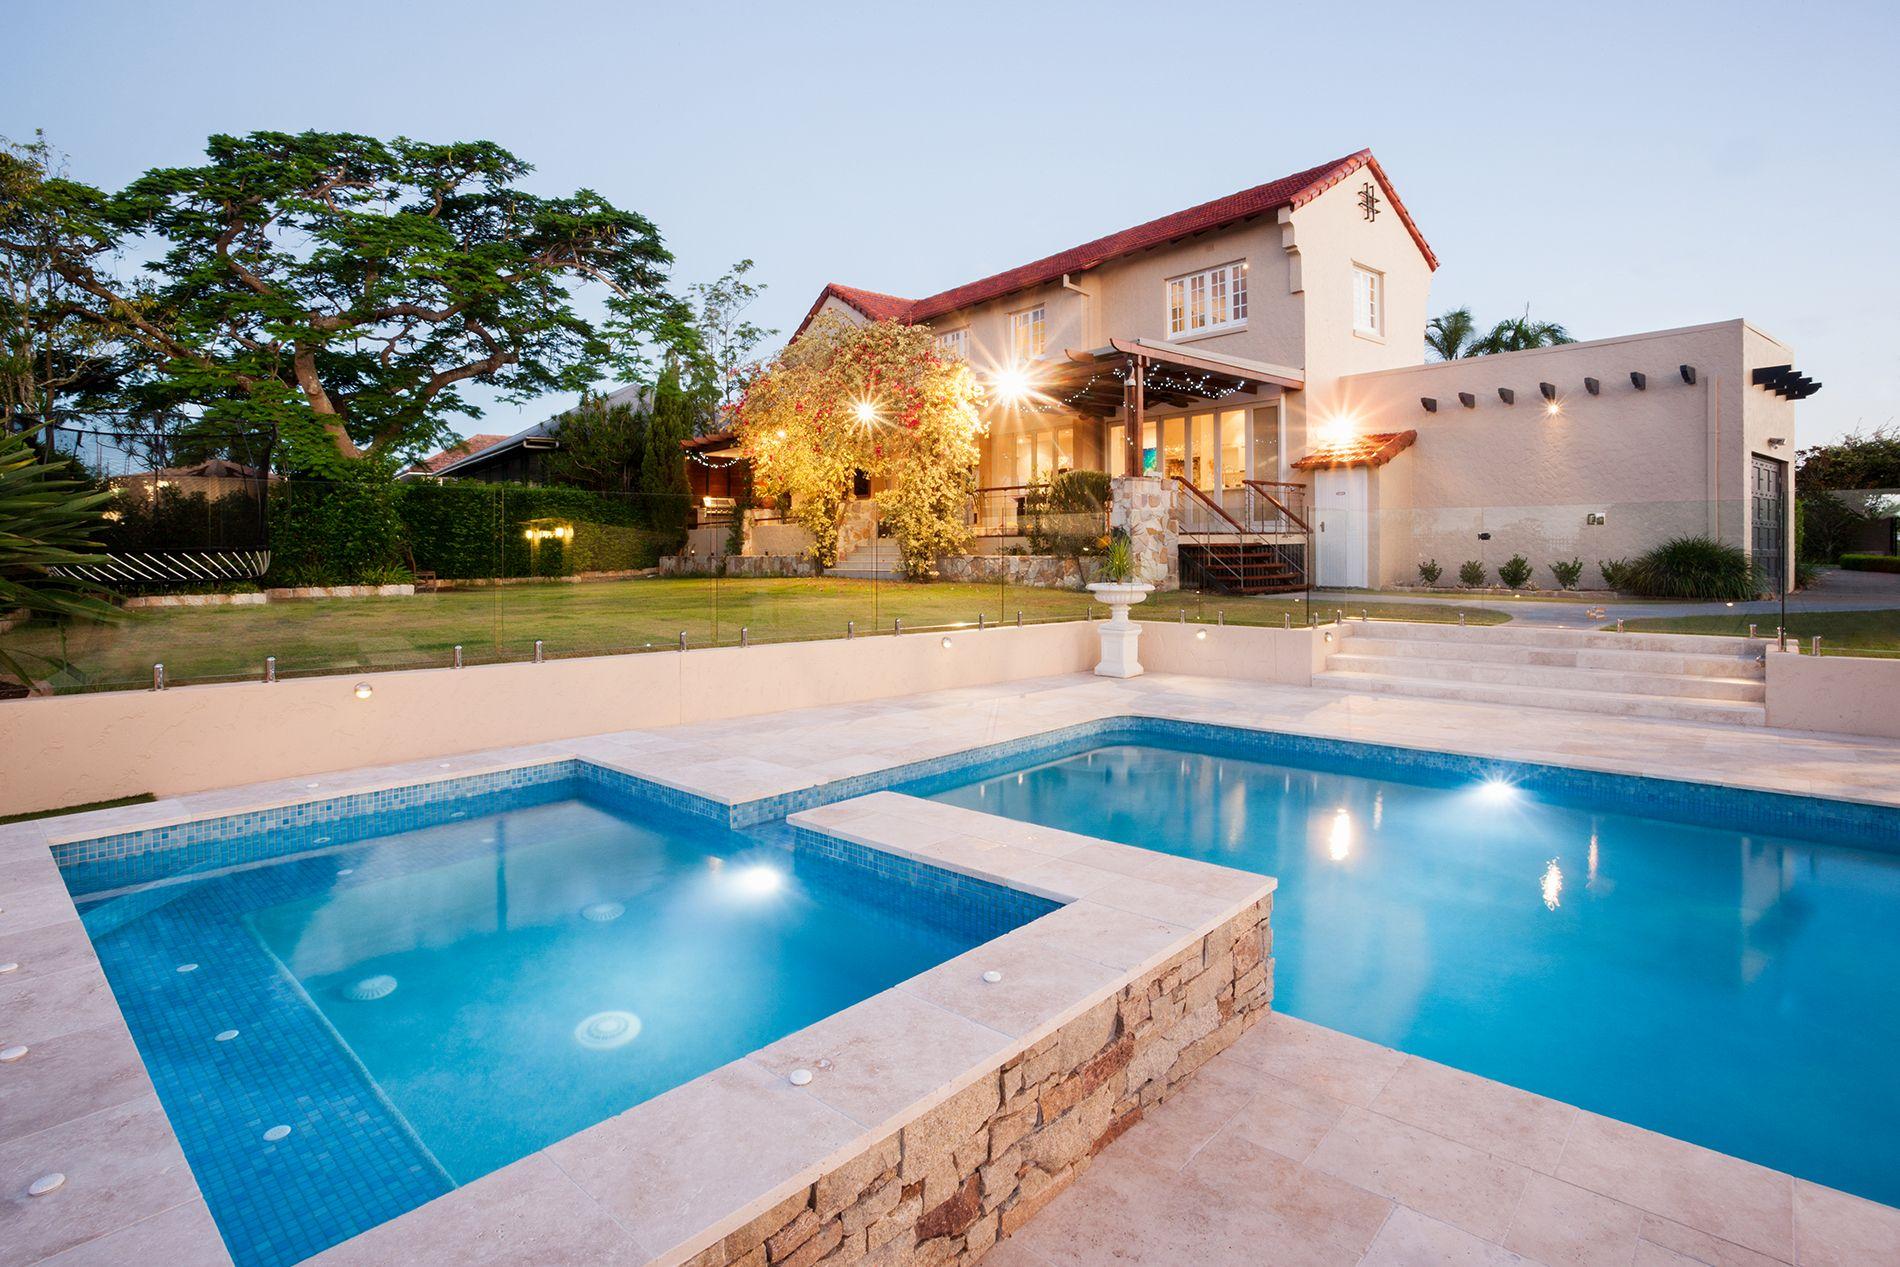 Pools & Surrounds Tiling